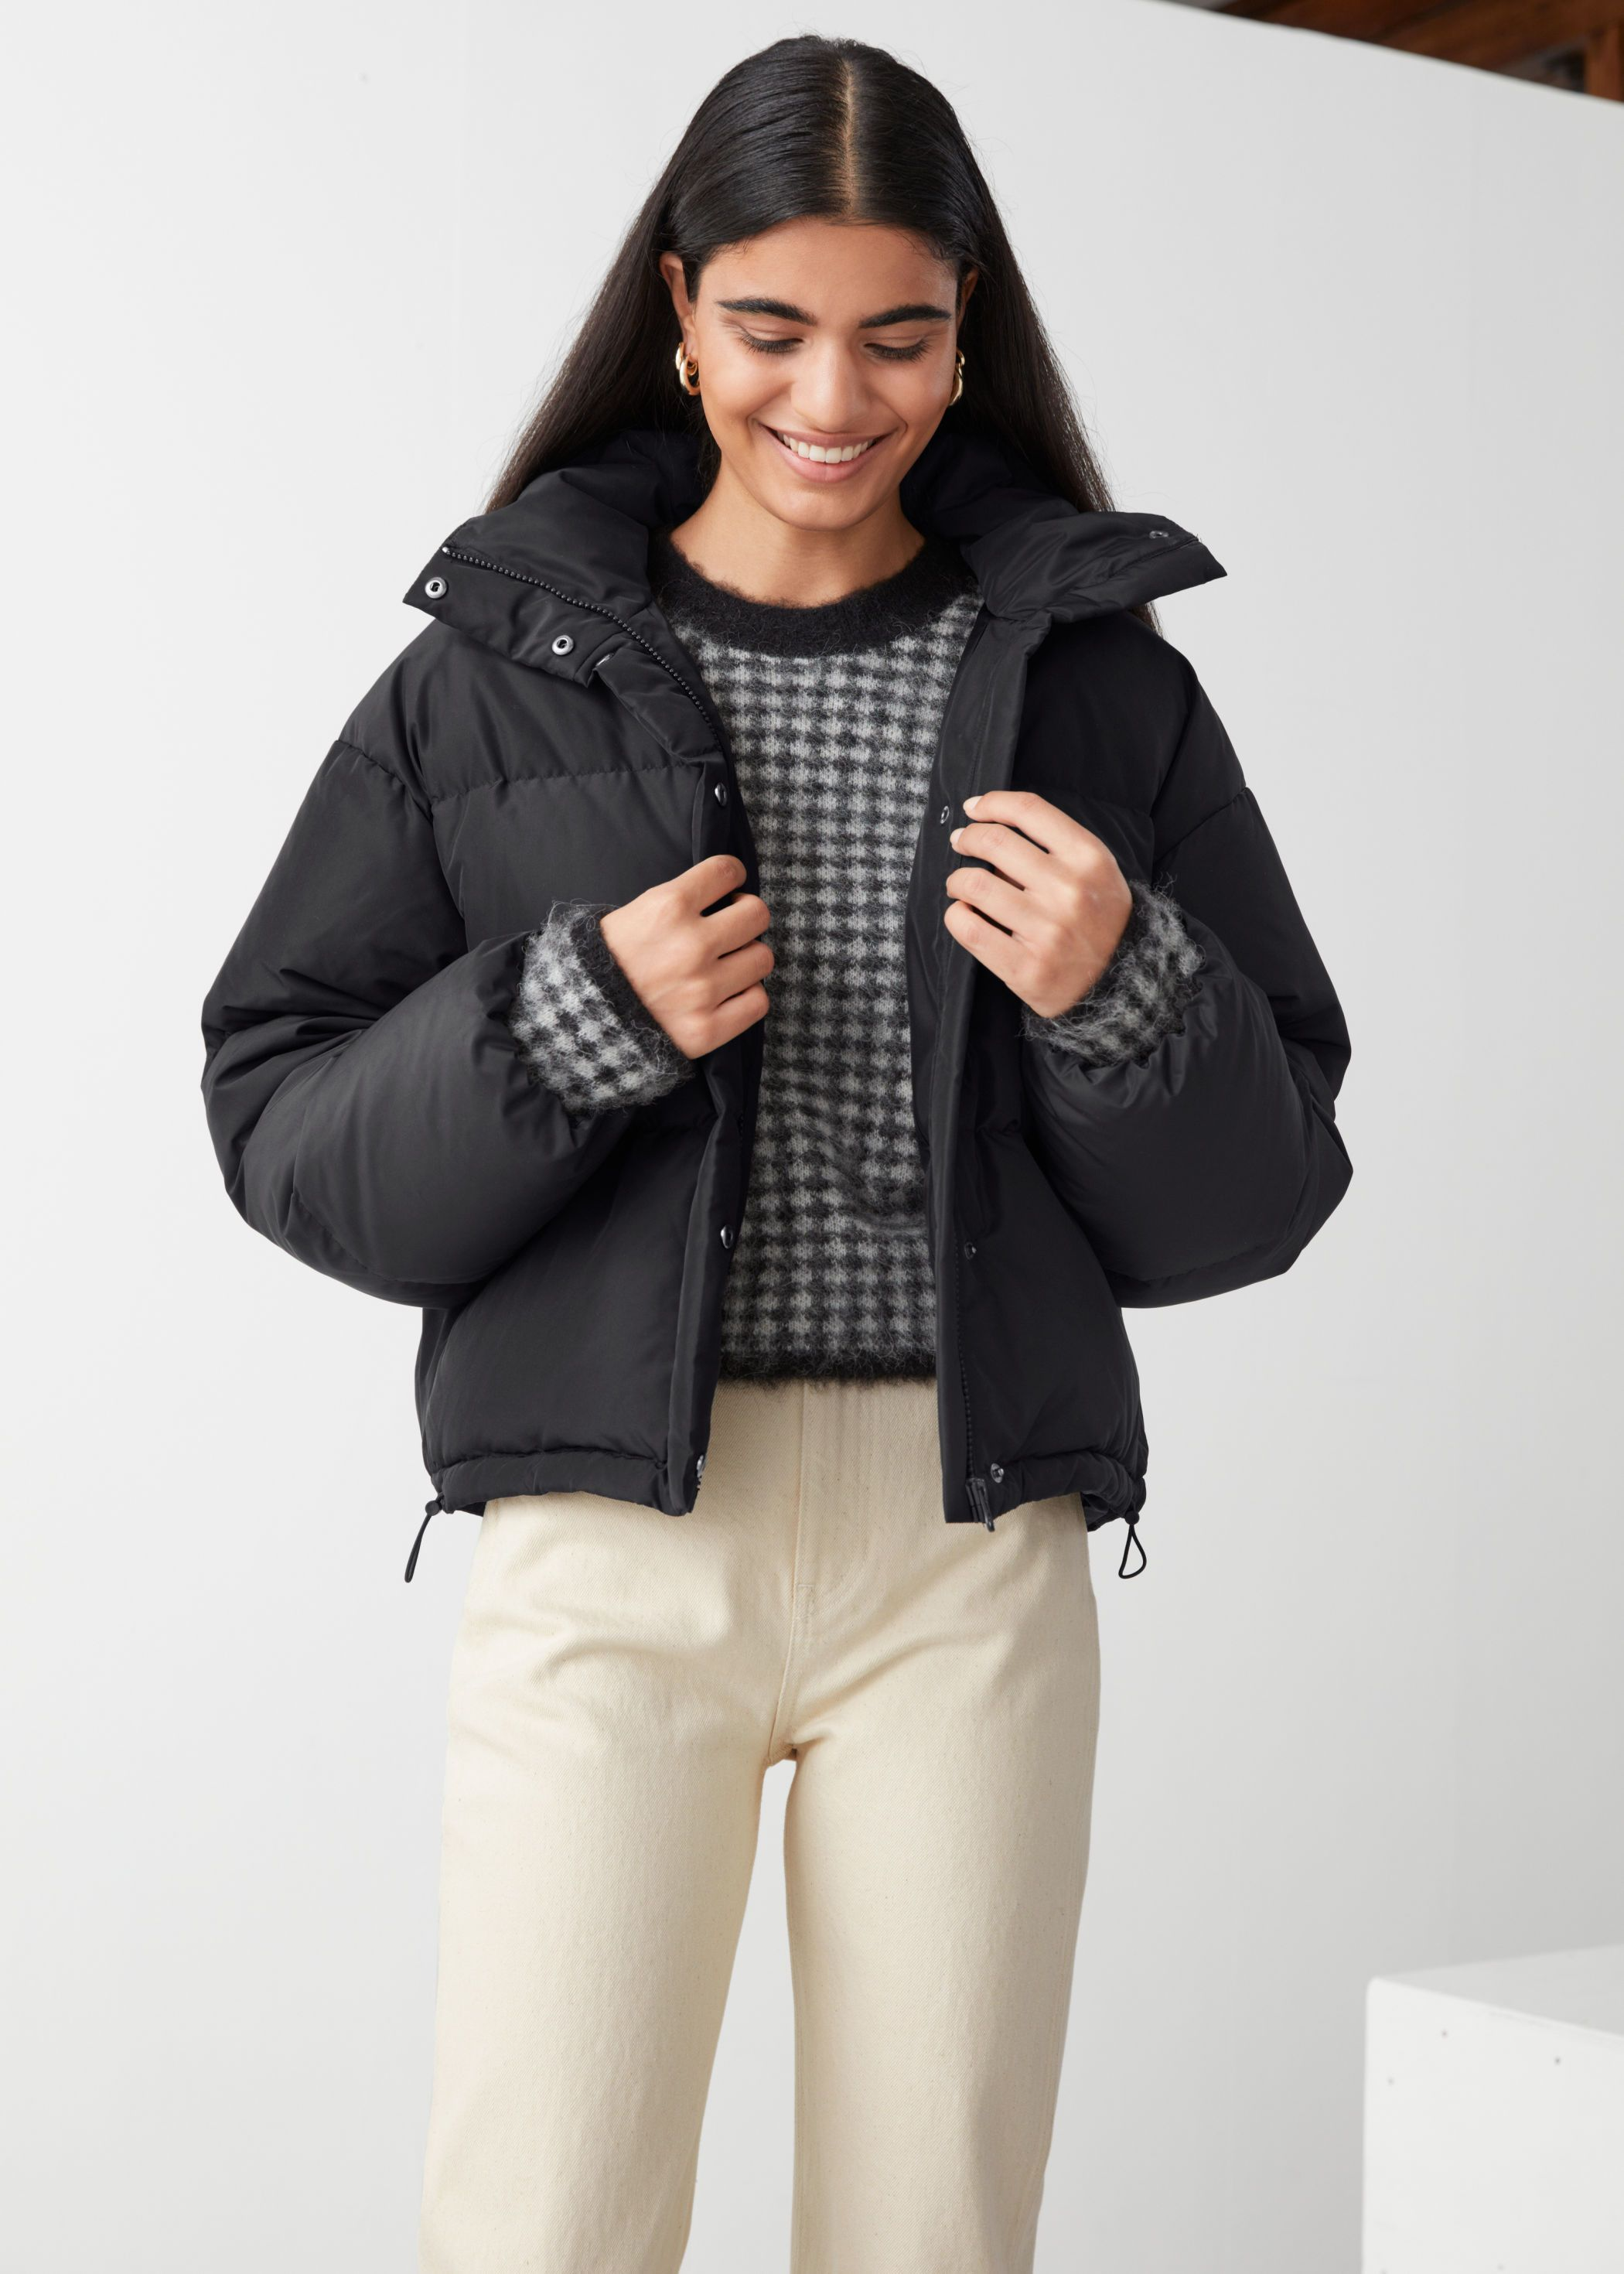 Short Oversized Puffer Jacket Puffer Jacket Outfit Jackets Oversized Puffer Jacket [ 2940 x 2100 Pixel ]